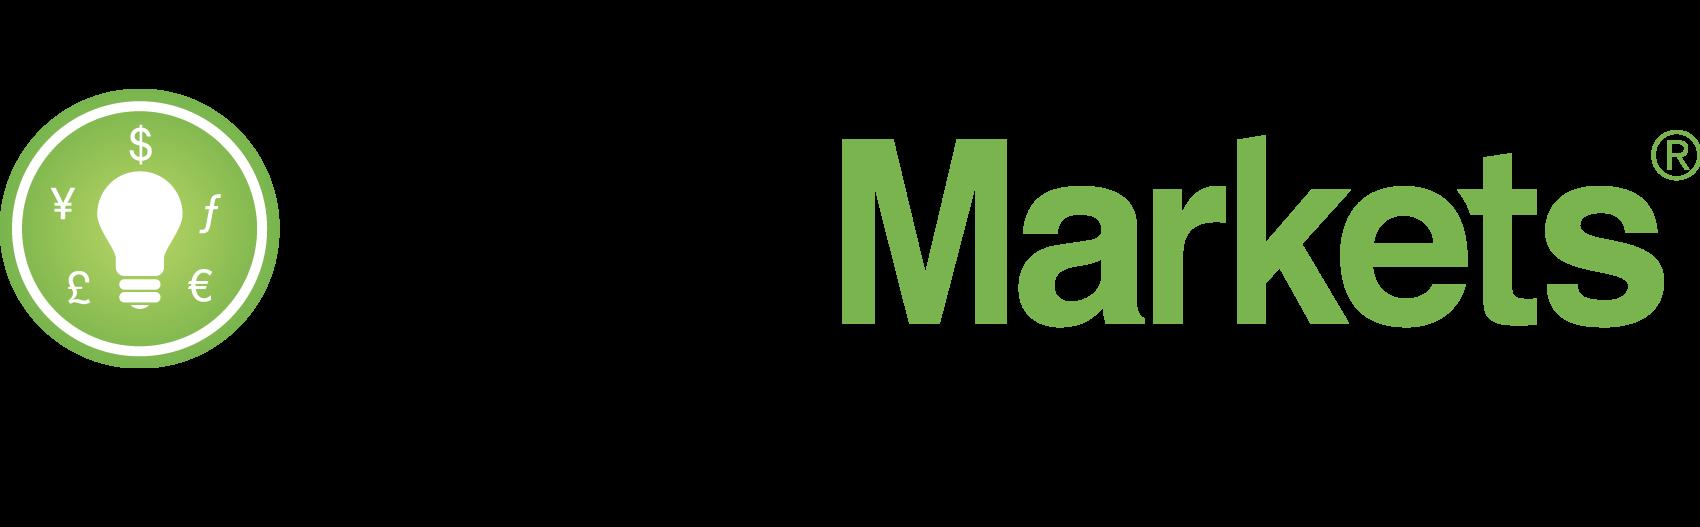 ThinkMarkets profile banner